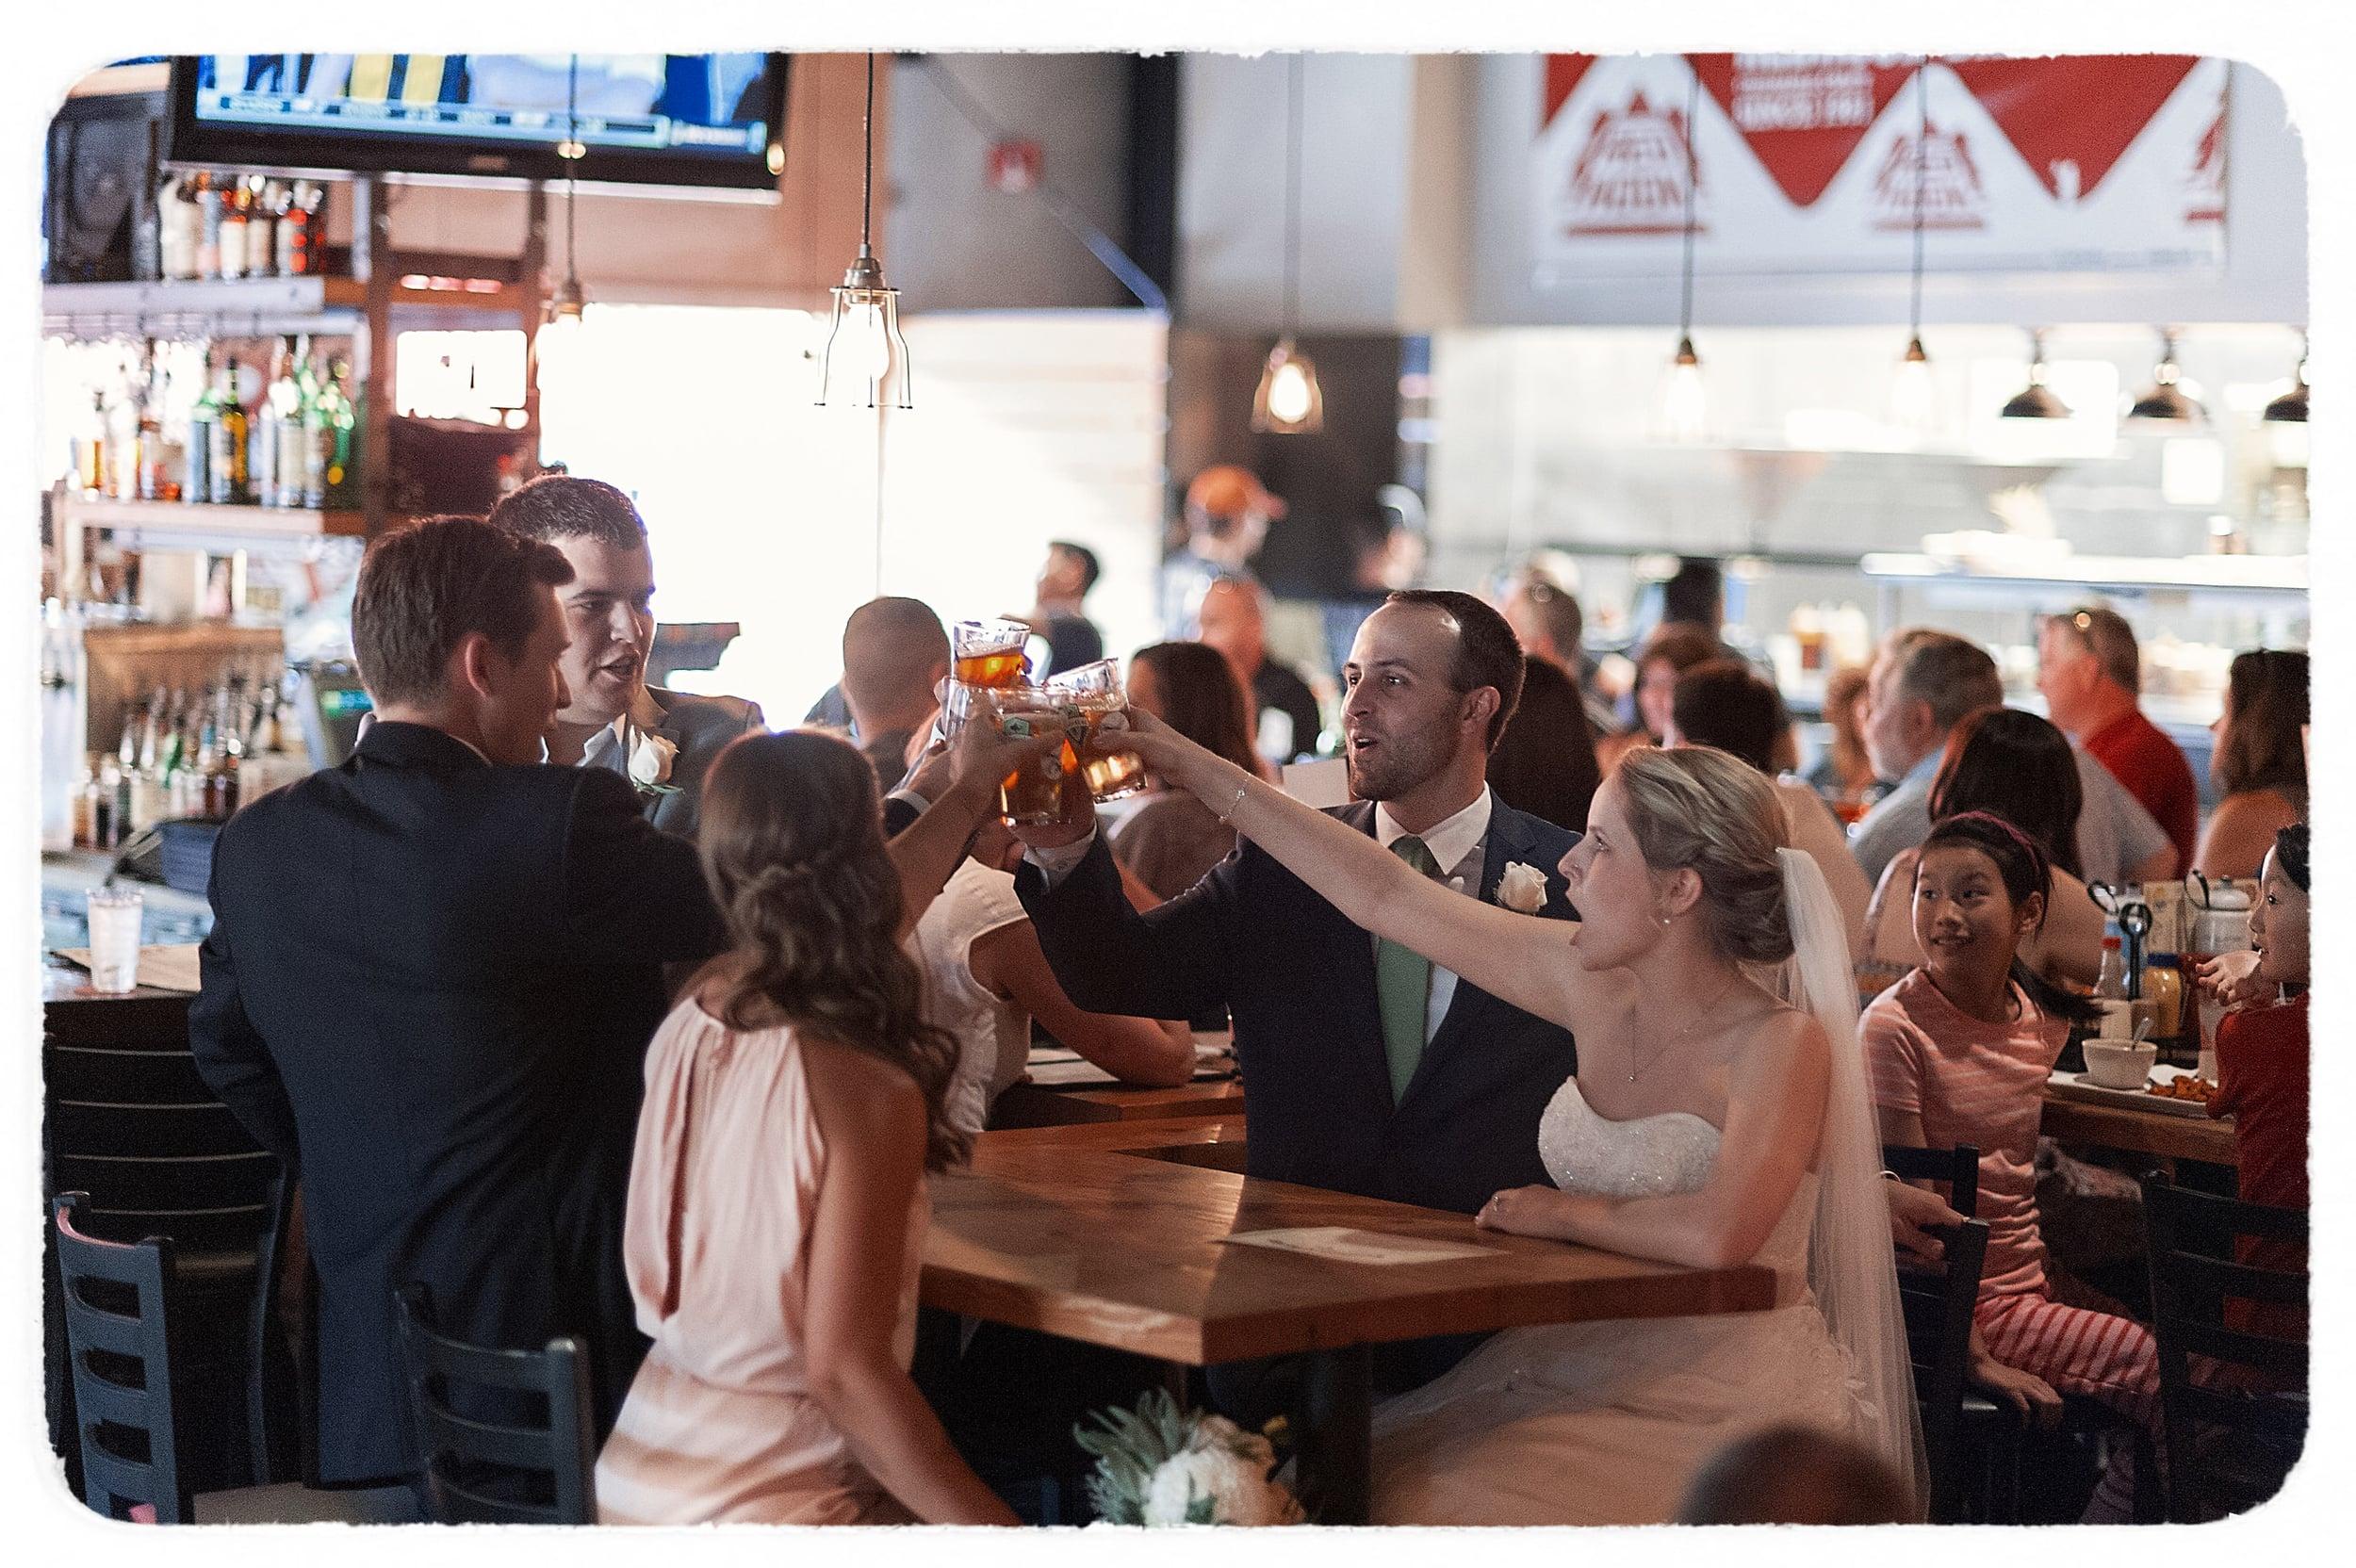 442 Kate&Marc-Wedding-OriginalCollection-442Film.jpg